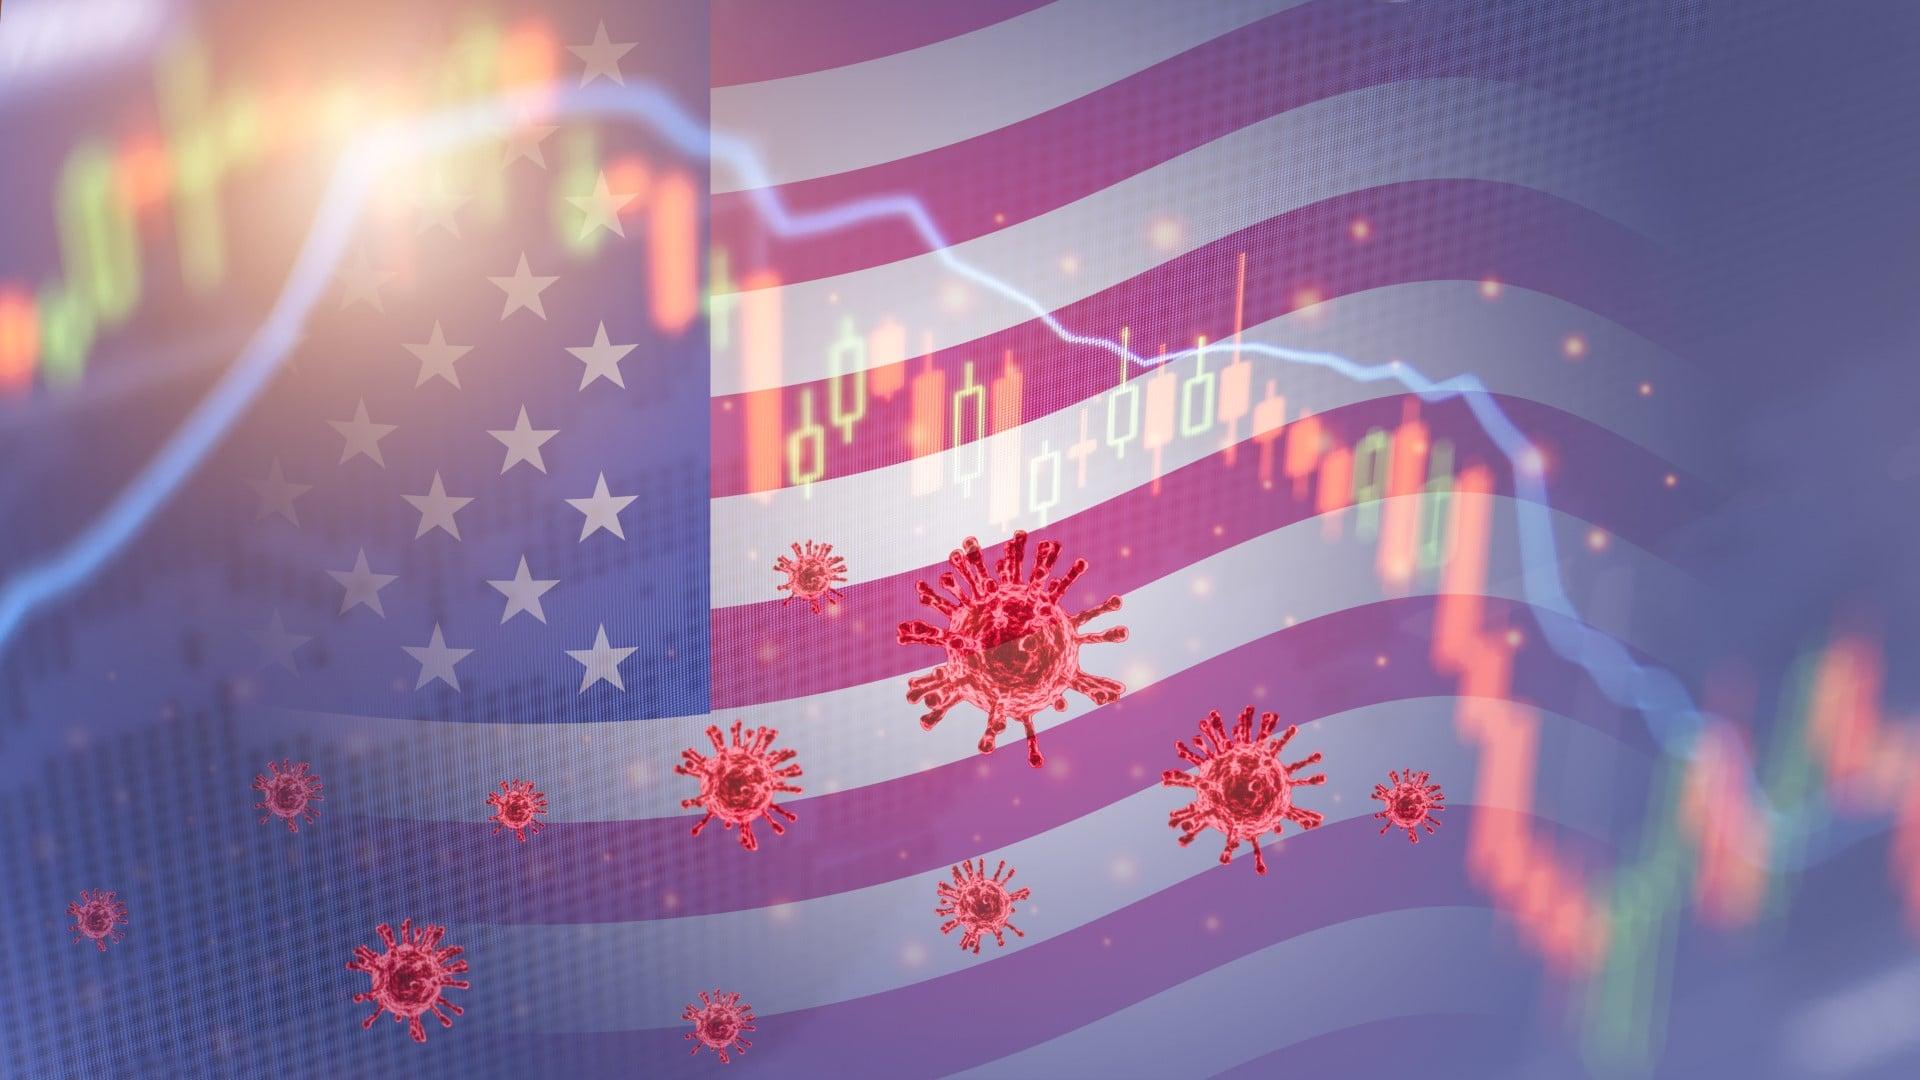 Coronavirus impact America economy stock markets financial crisis concept,The coronavirus or covid-19 sinks the America stock exchanges. Graphs representing the stock market crash caused